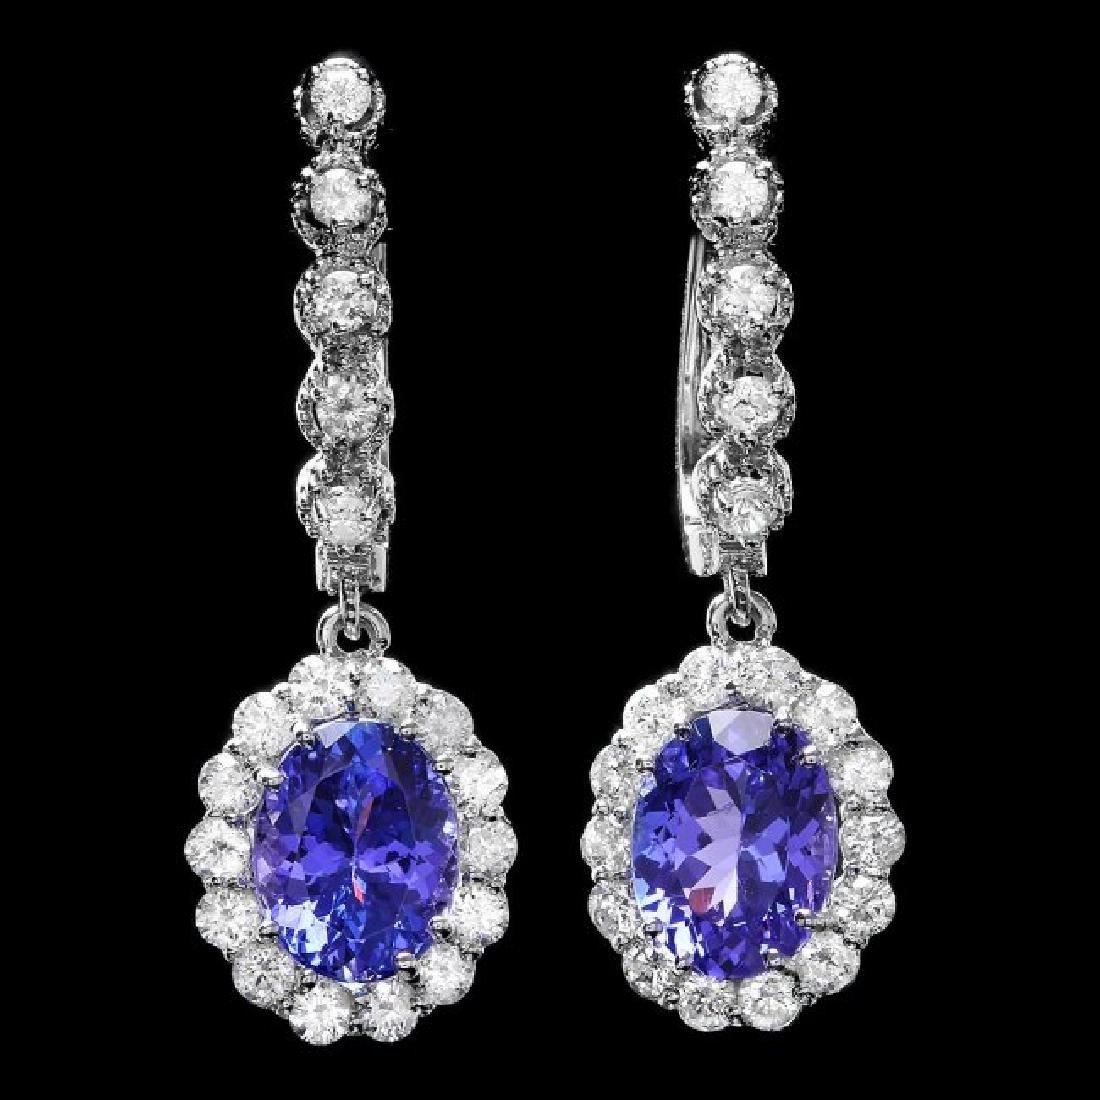 14k Gold 4ct Tanzanite 1.35ct Diamond Earrings